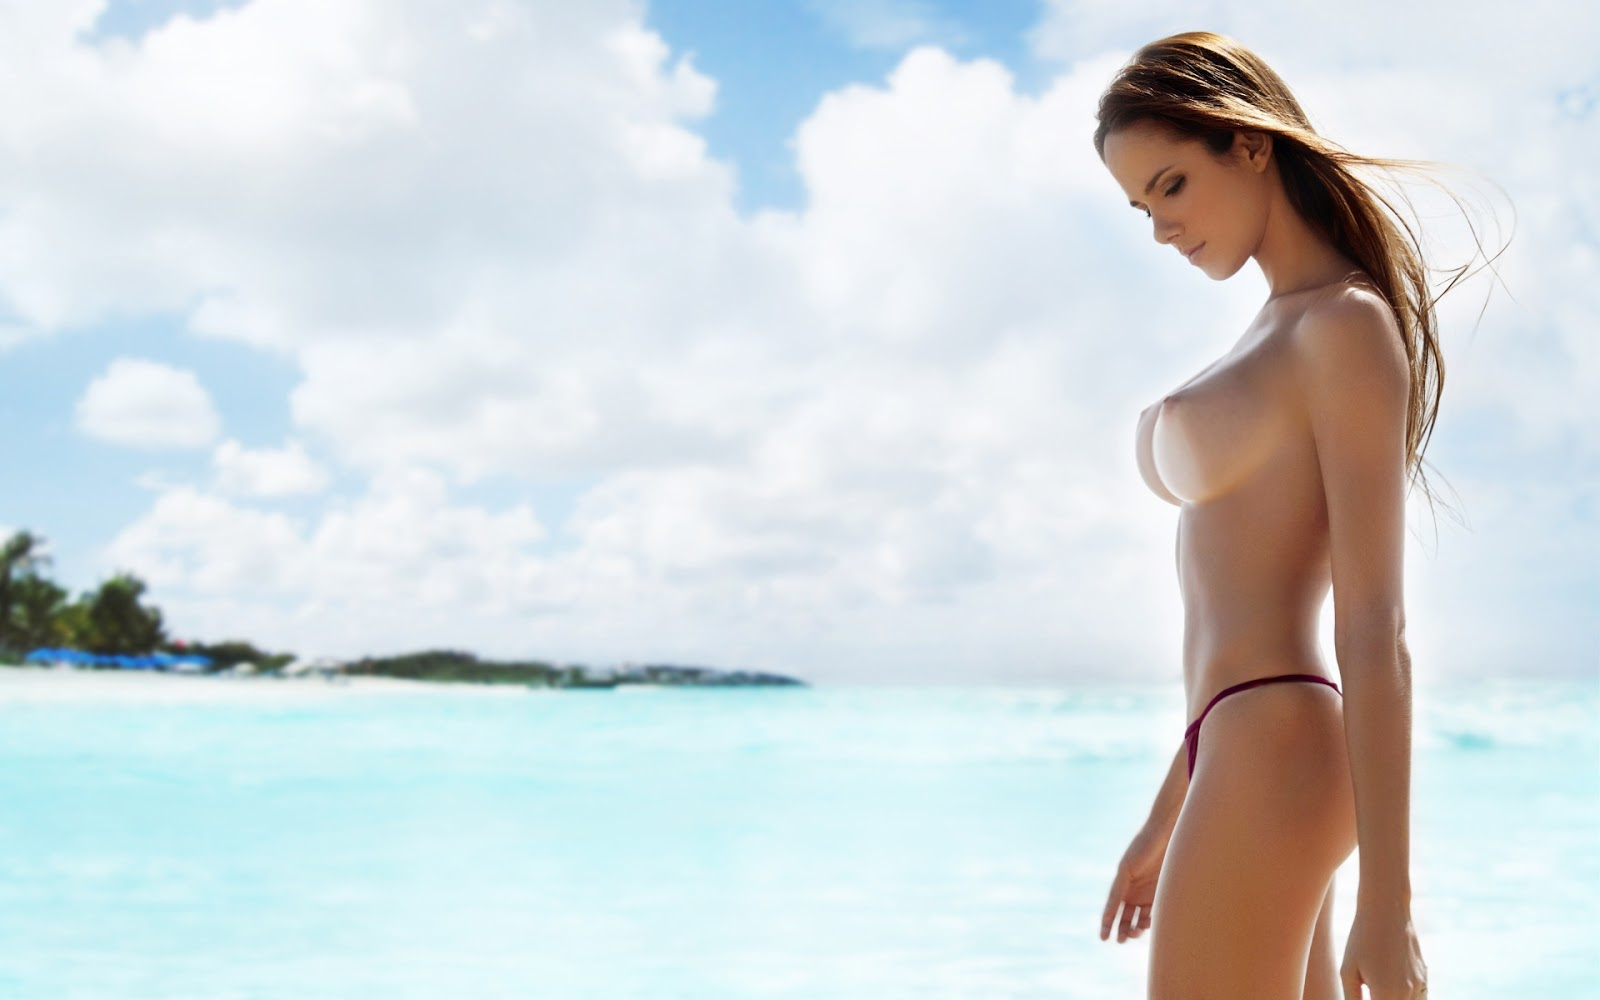 Nude beach roberta murgo